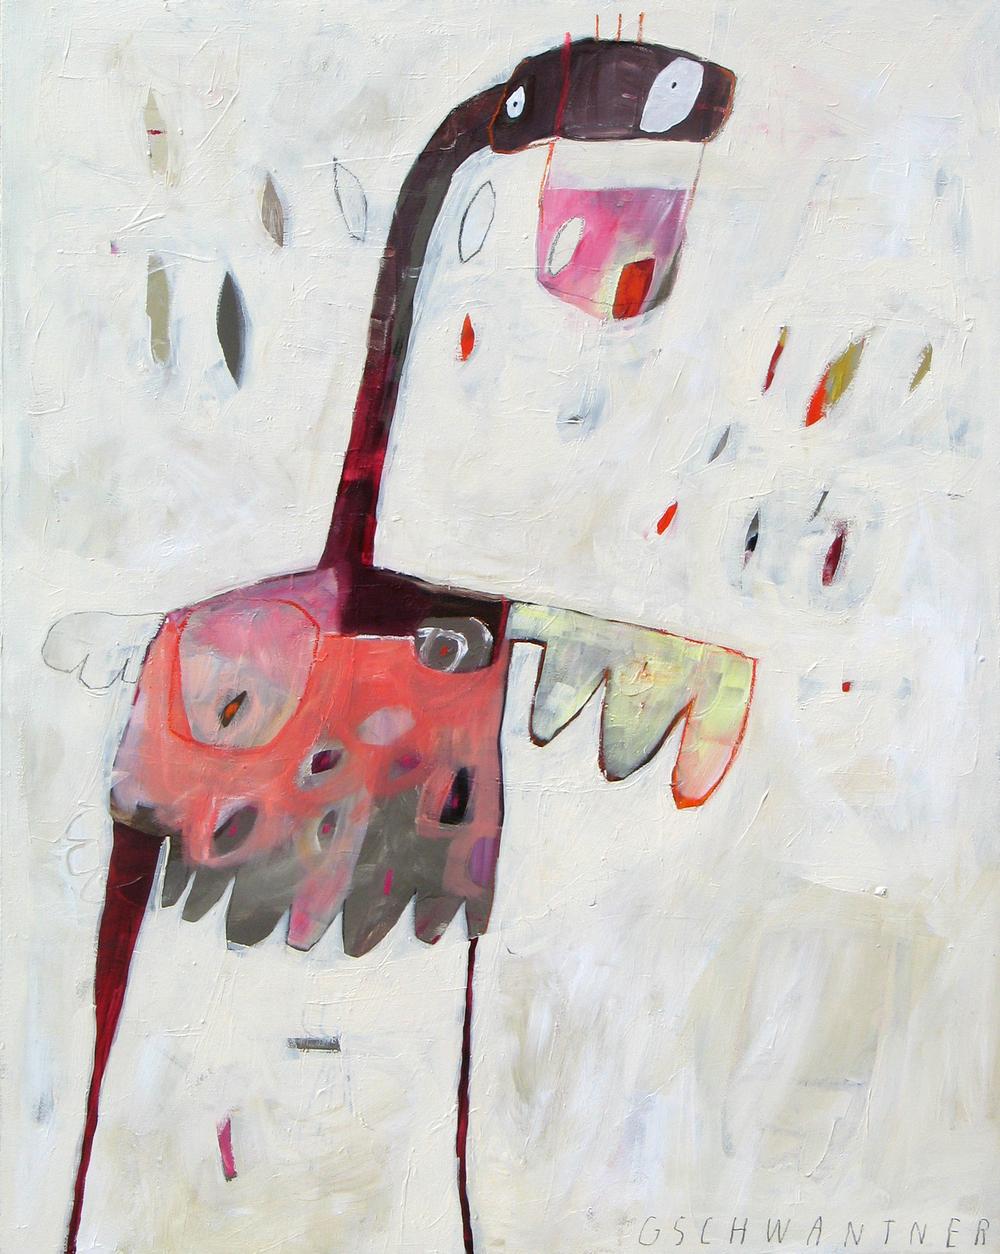 Entenfrau, 2006, 112 x 87